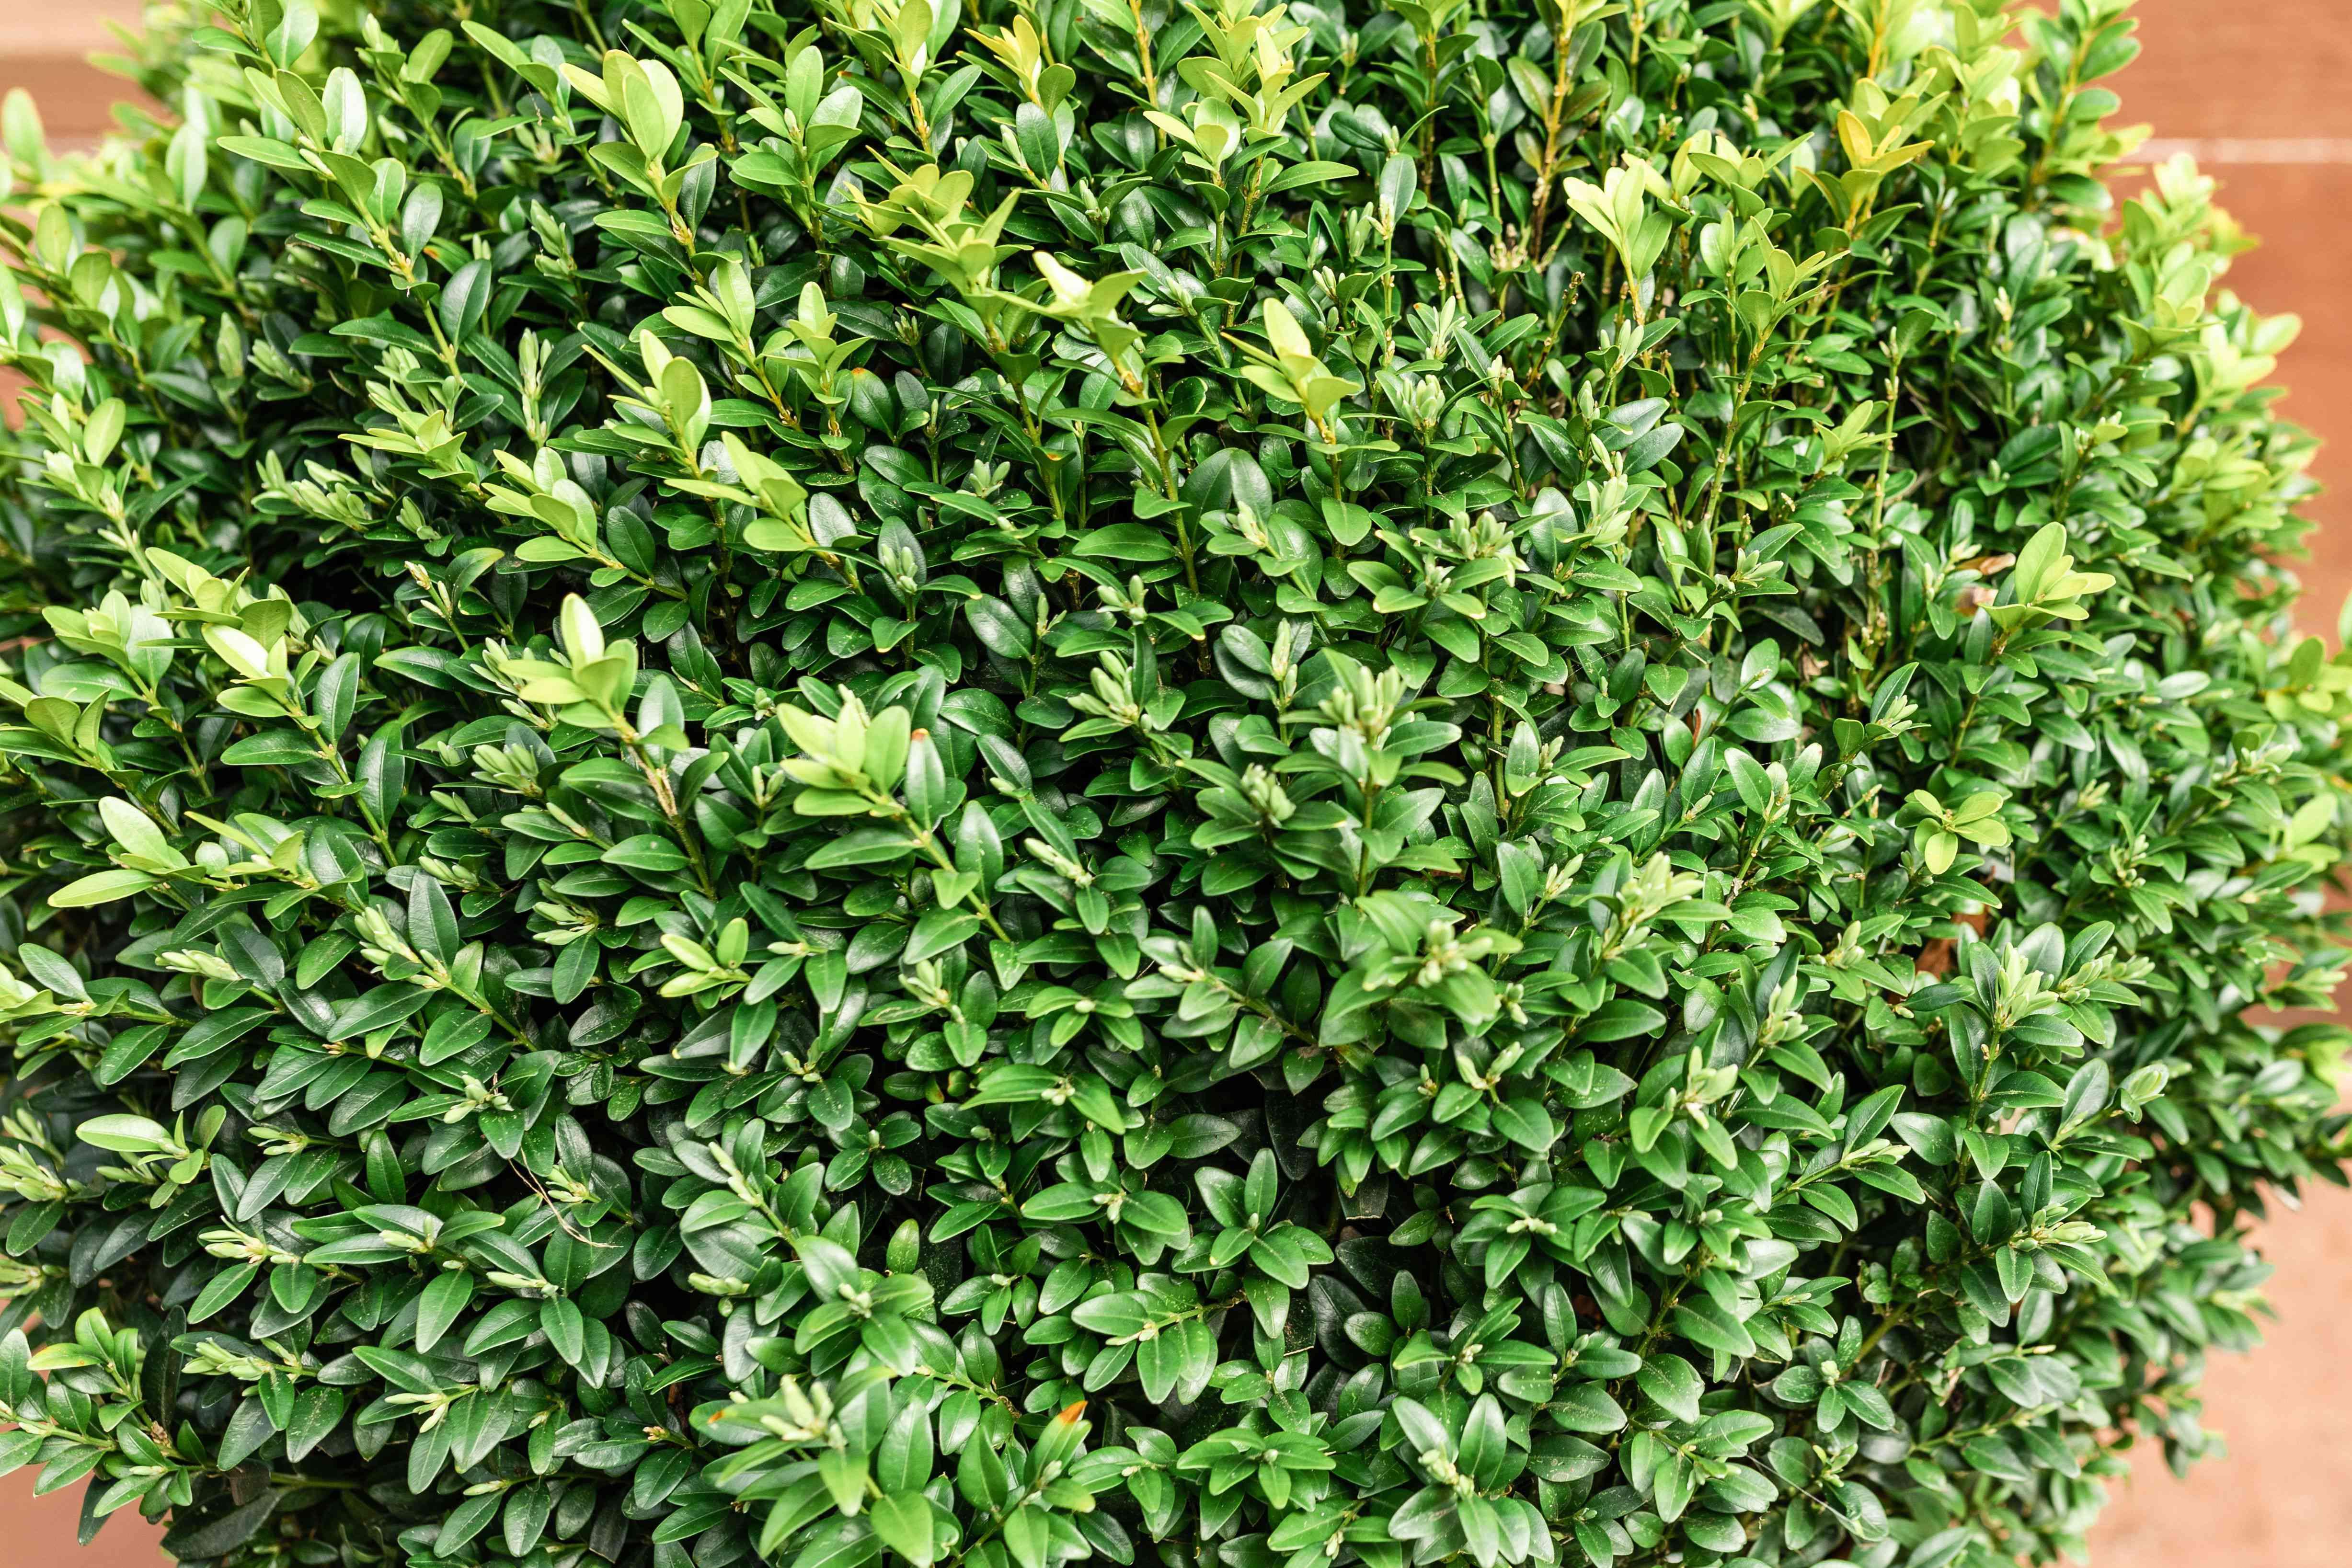 Common boxwood shrub with dense light-green leaves